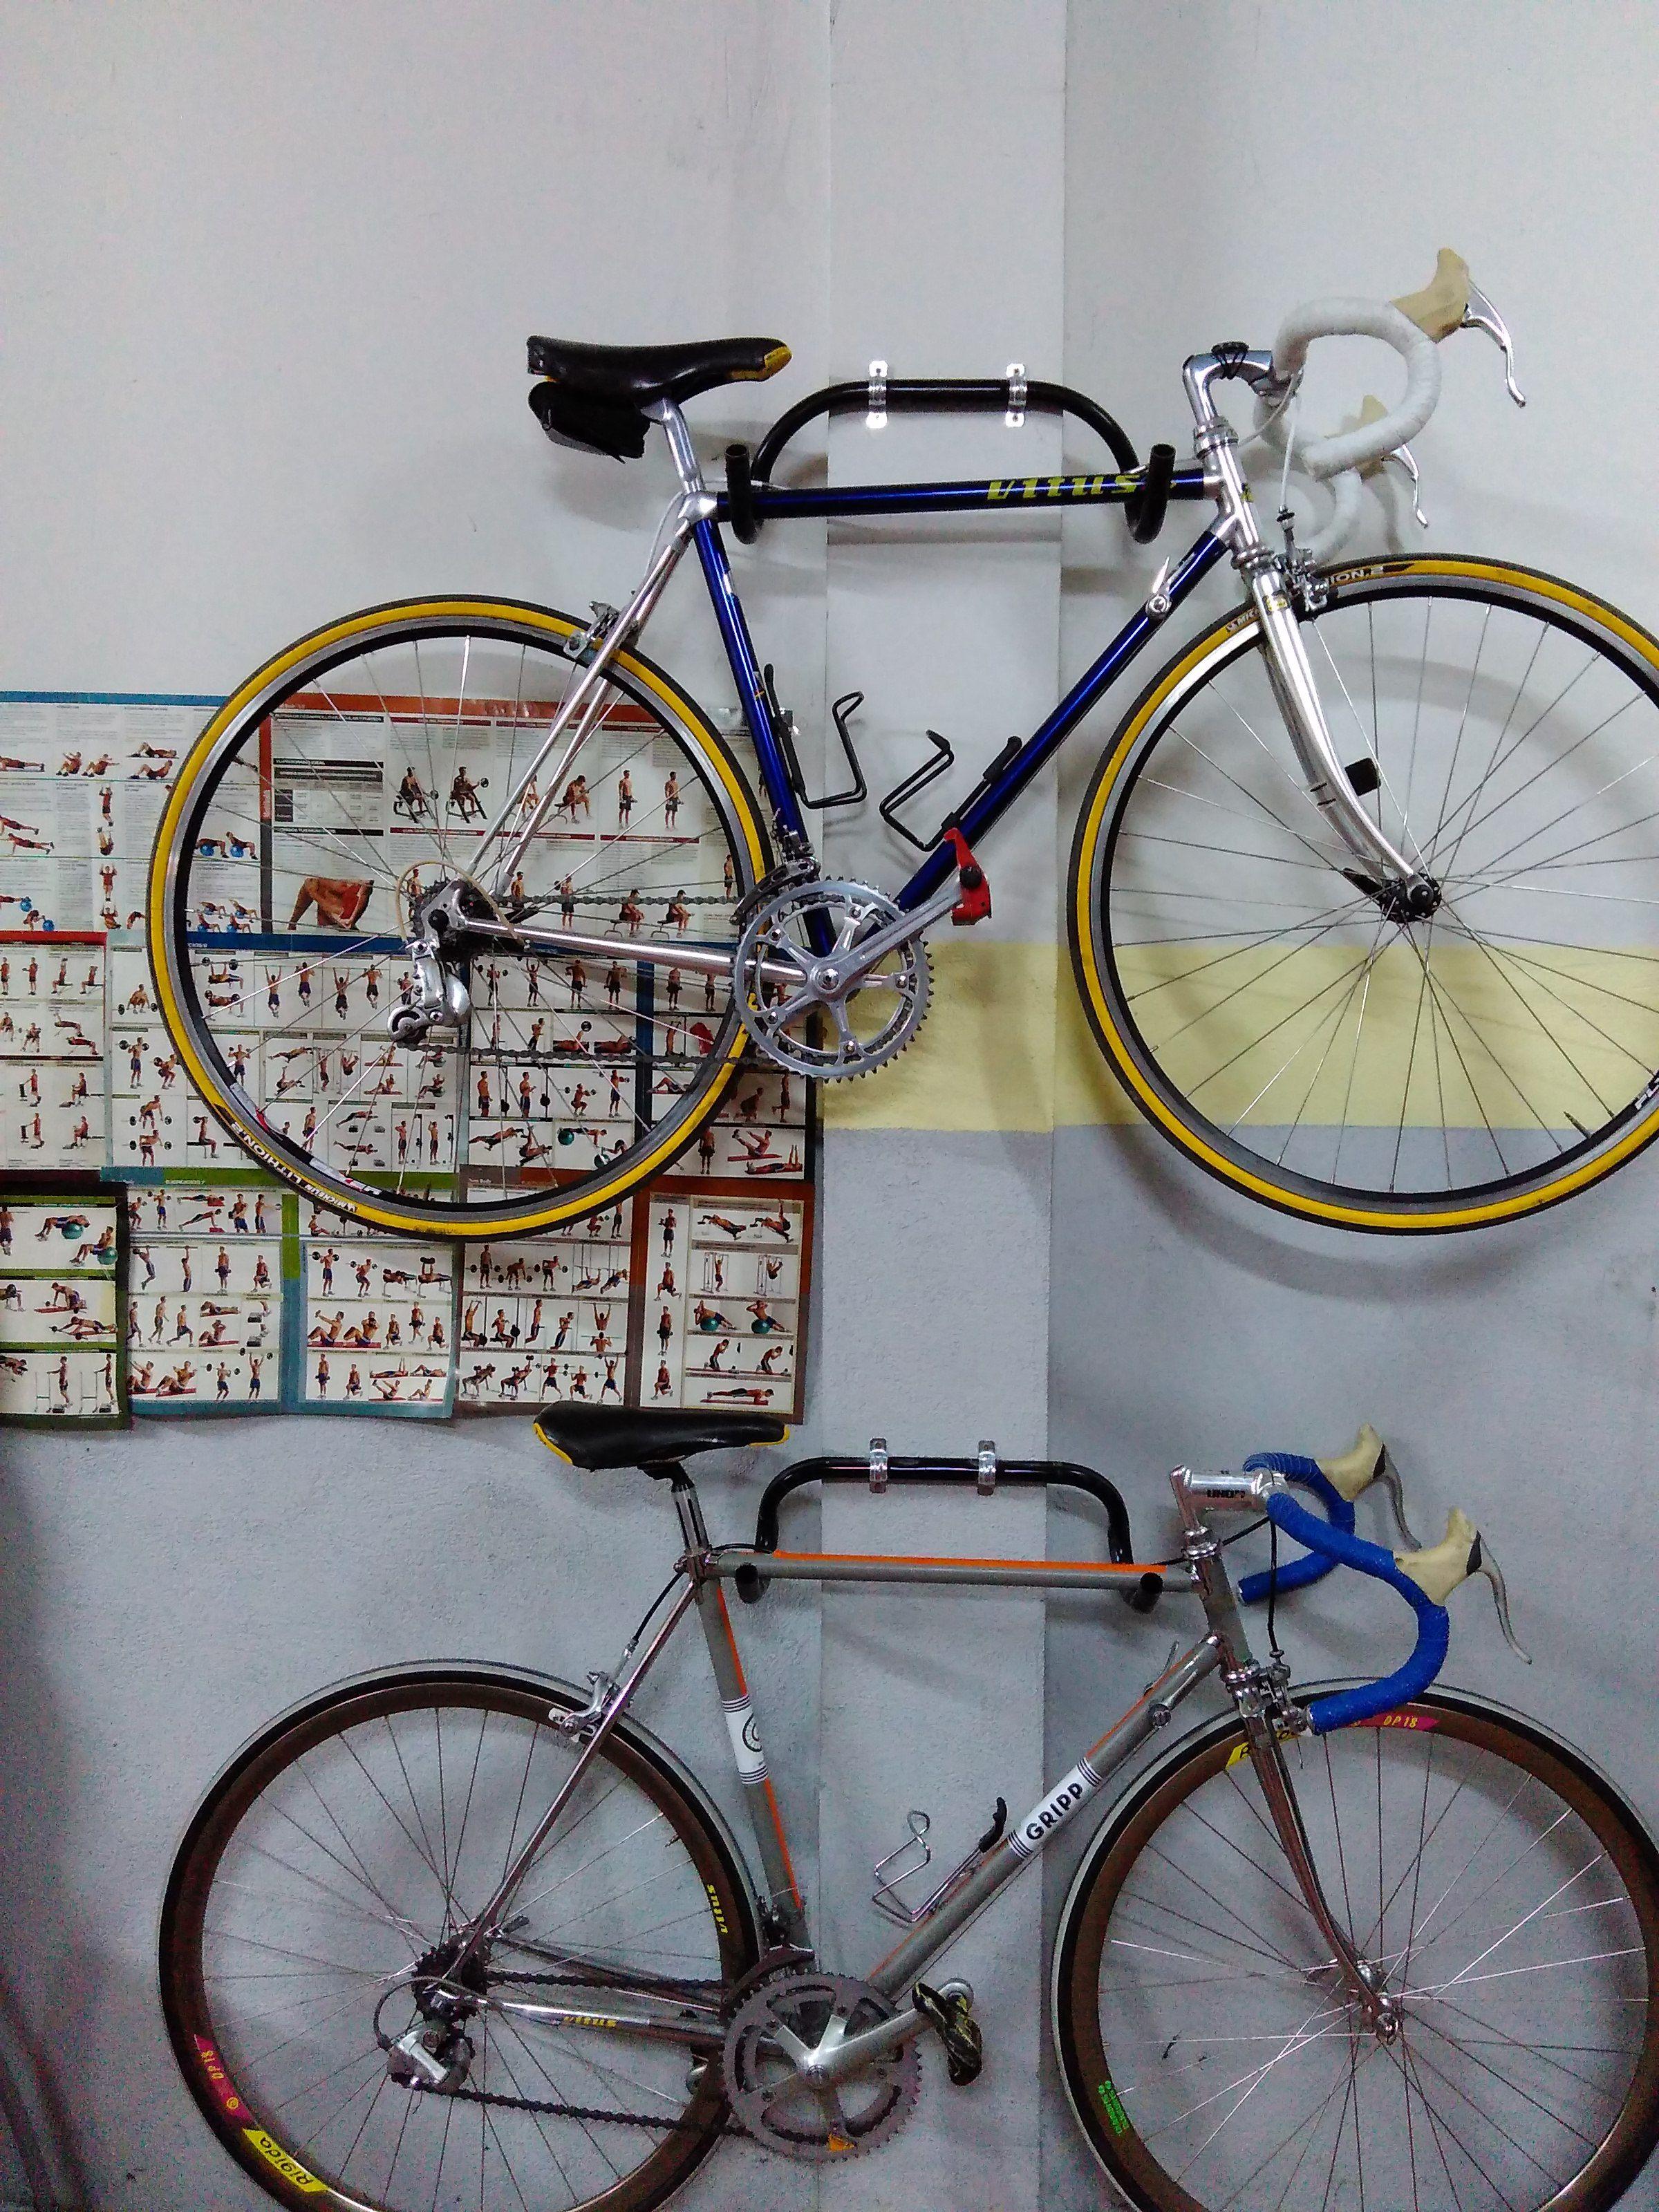 Contemporáneo de Arte para Decoración de pared de metal escultura-Negro Pedal Bicicleta Ciclo